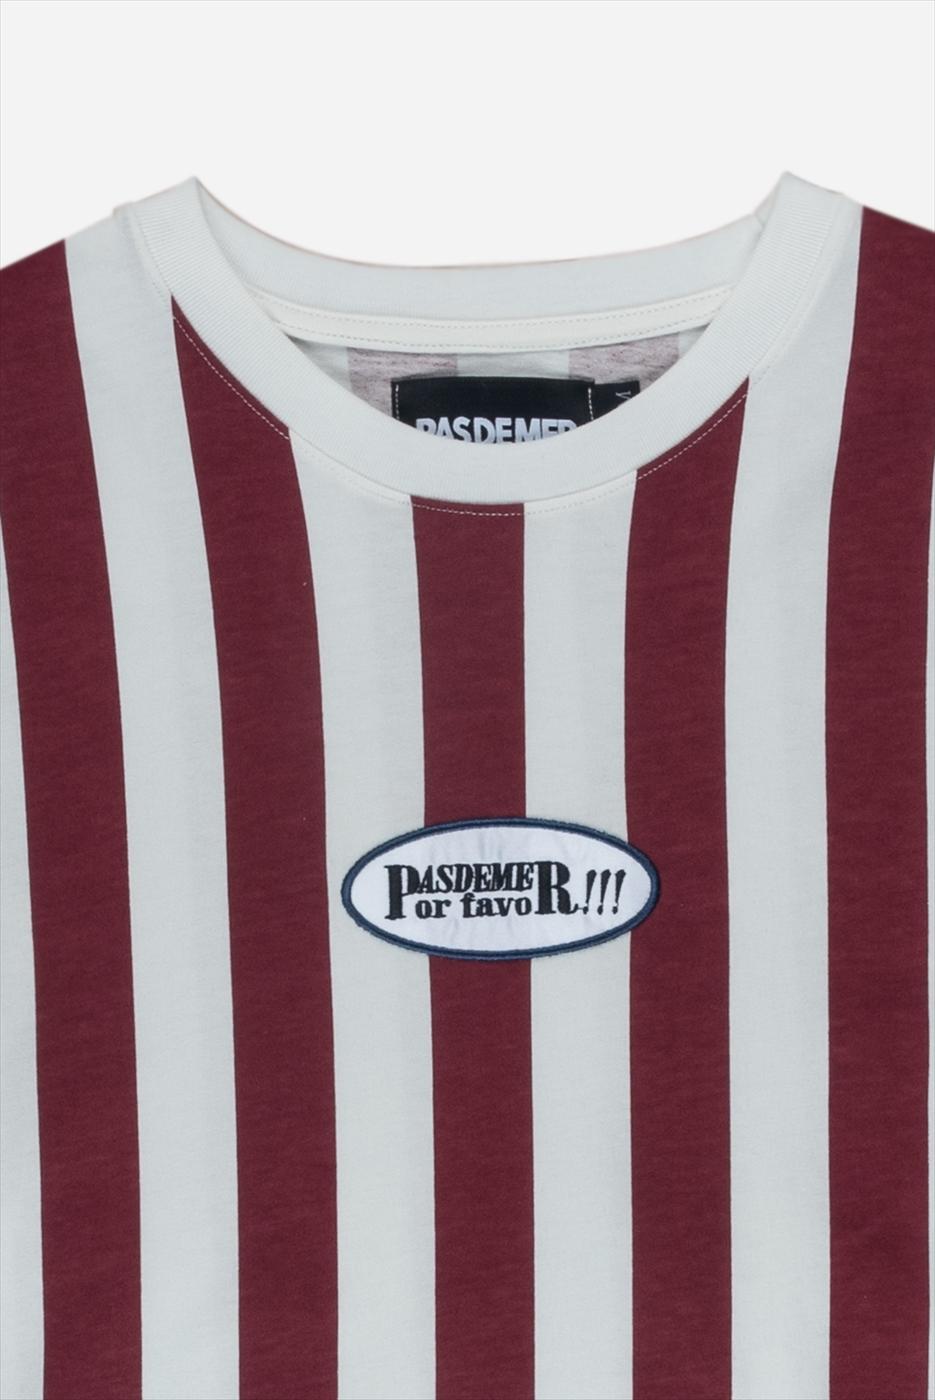 【PAS DE MER/パドゥメ】POR FAVOR T-SHIRT  カットソーTシャツ / NATURAL/BURGUNDY STRIPES